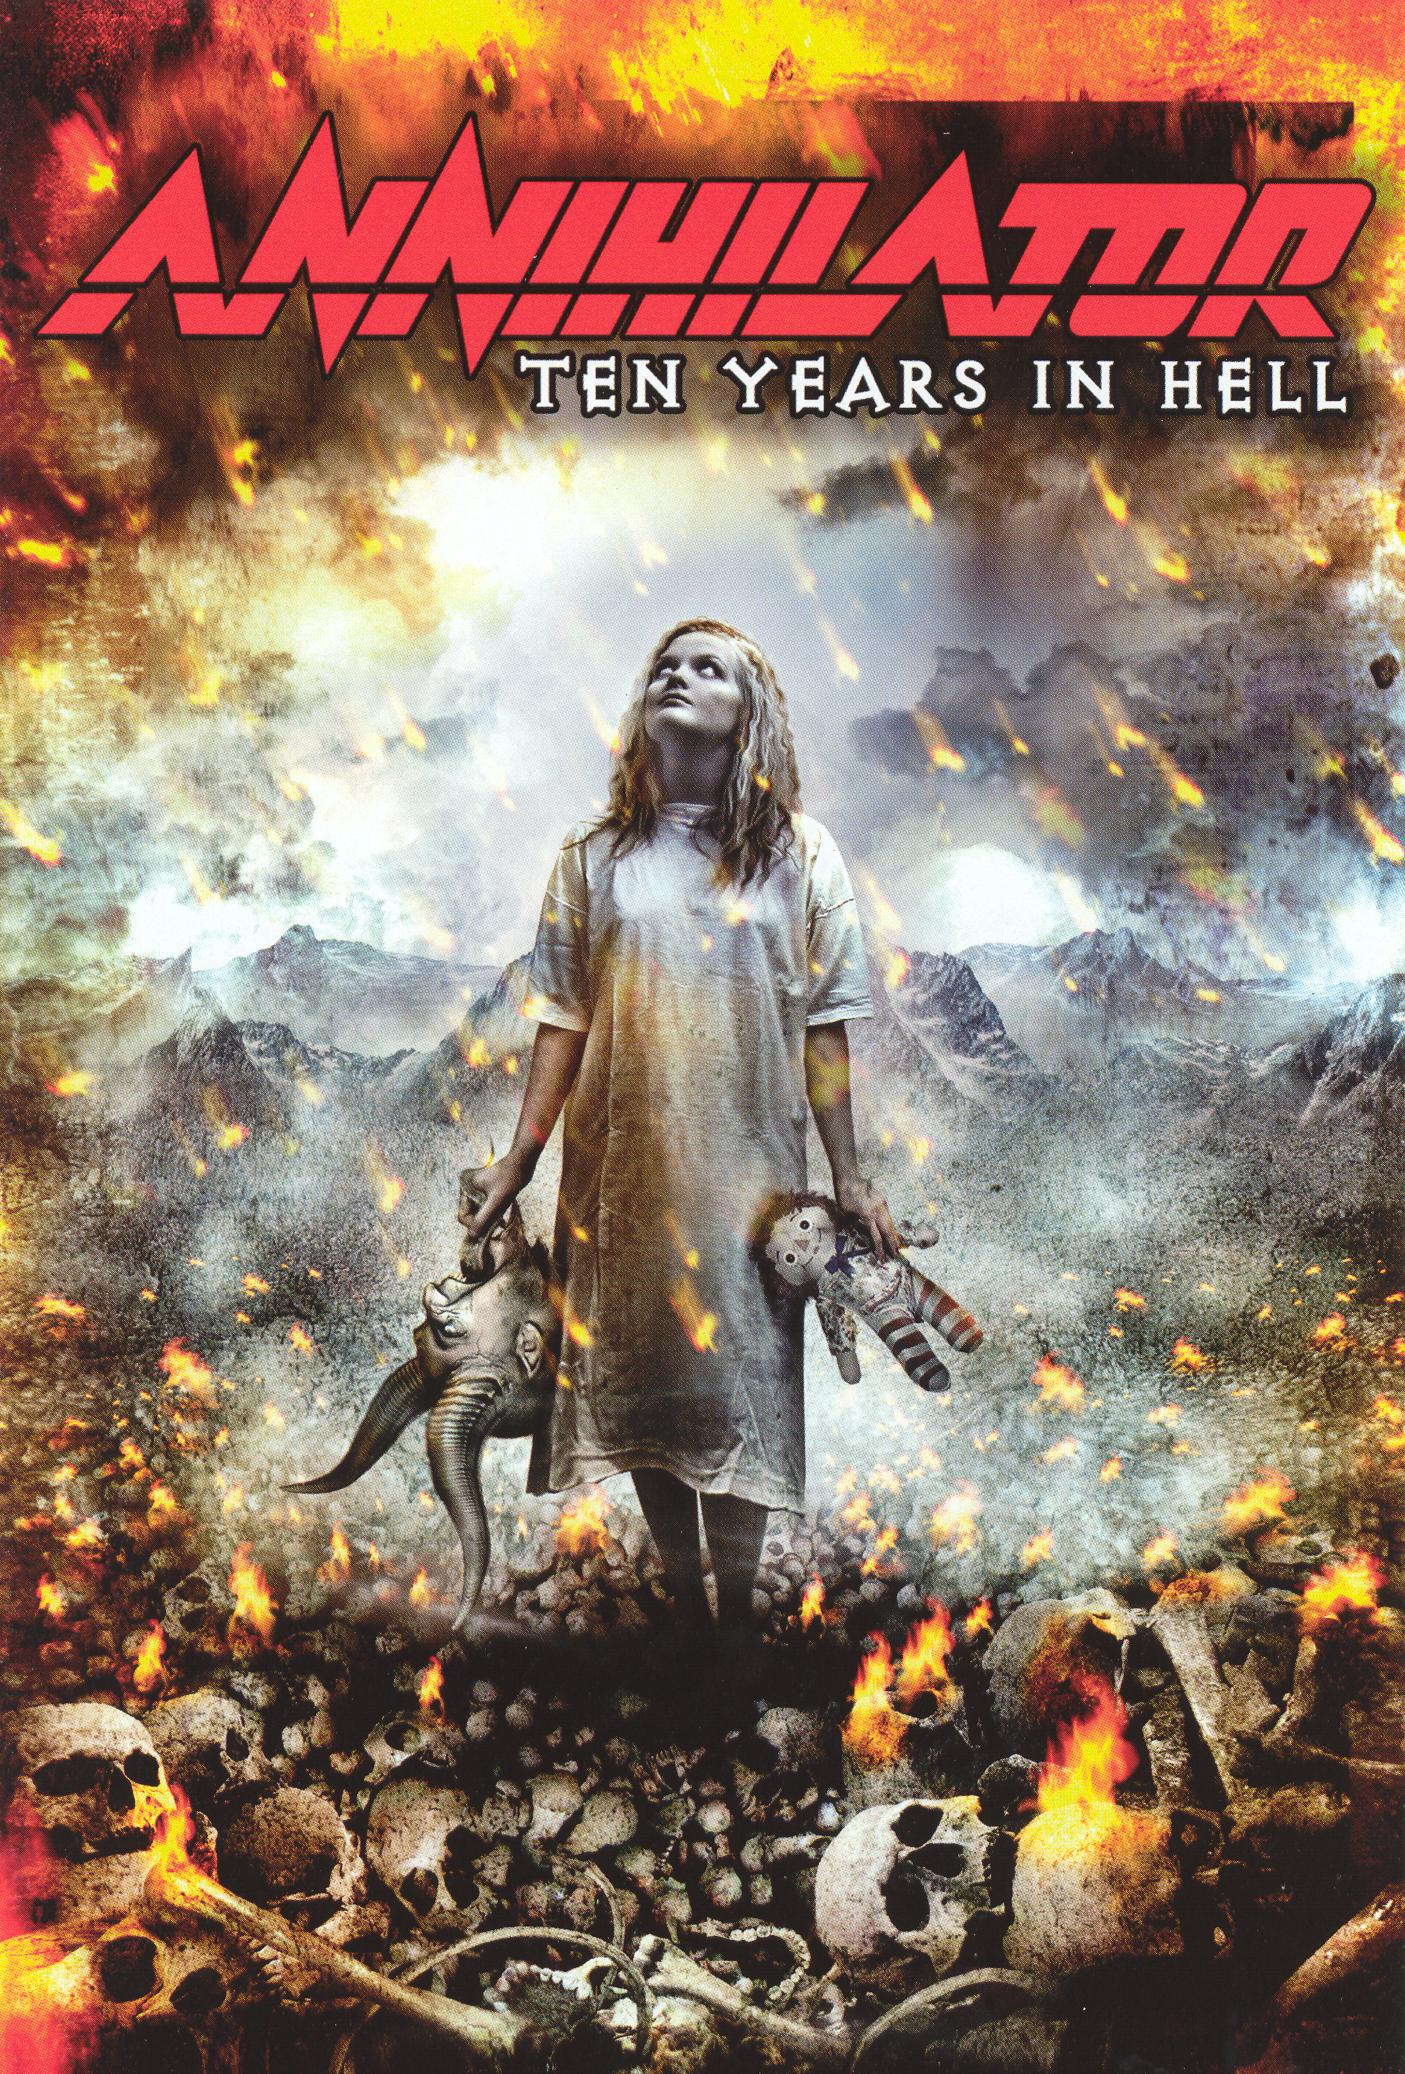 Annihilator: Ten Years in Hell